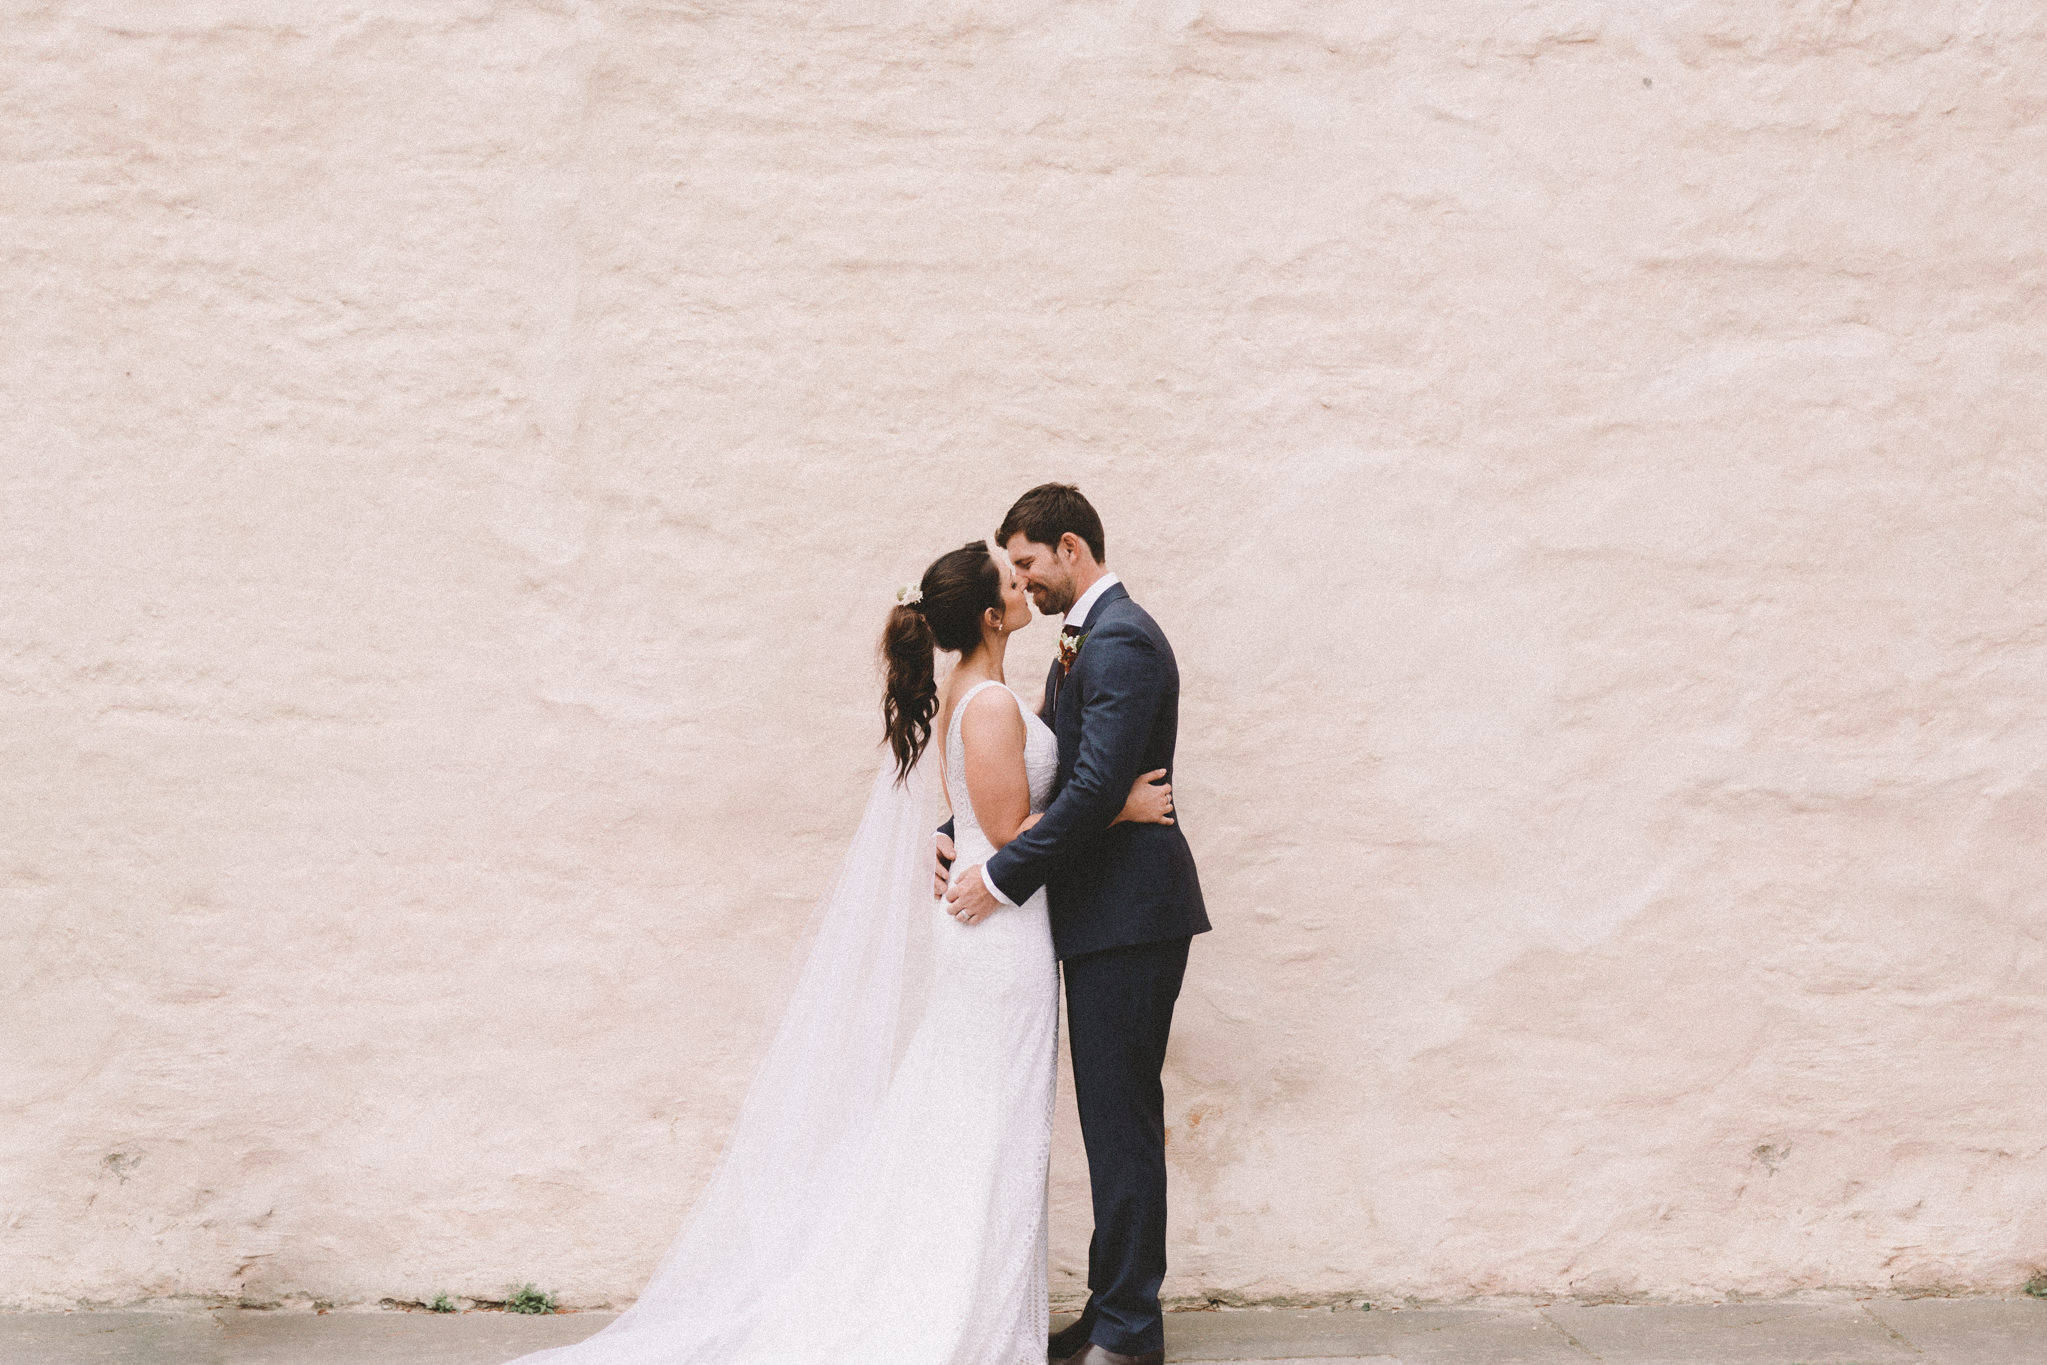 Melbourne Yarra Valley Wedding Photographer 0122.JPG